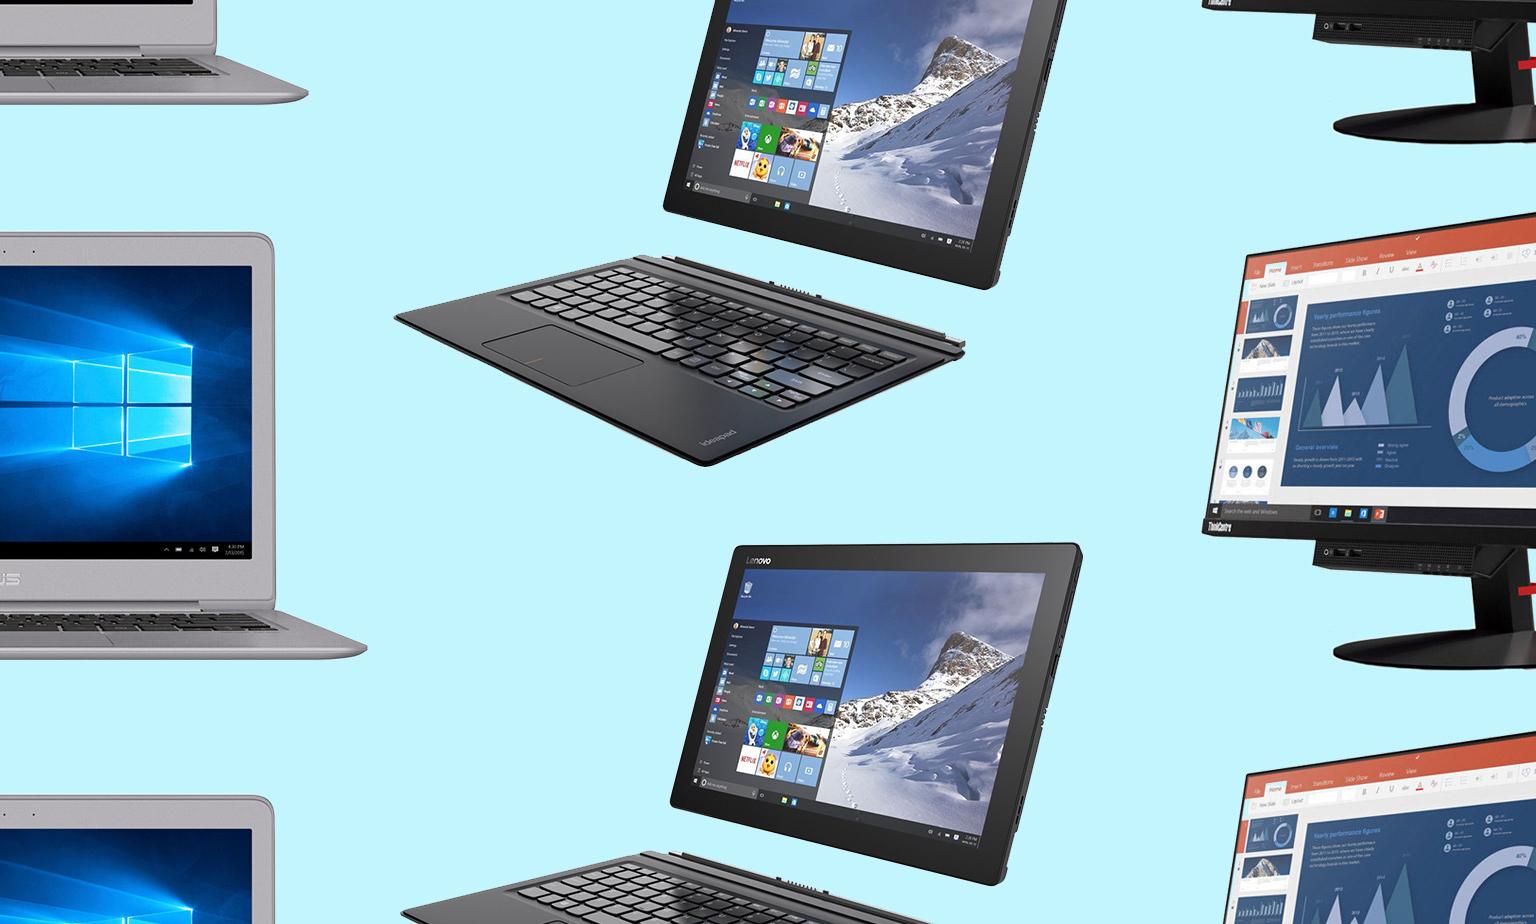 20% off select Laptops & Desktops*